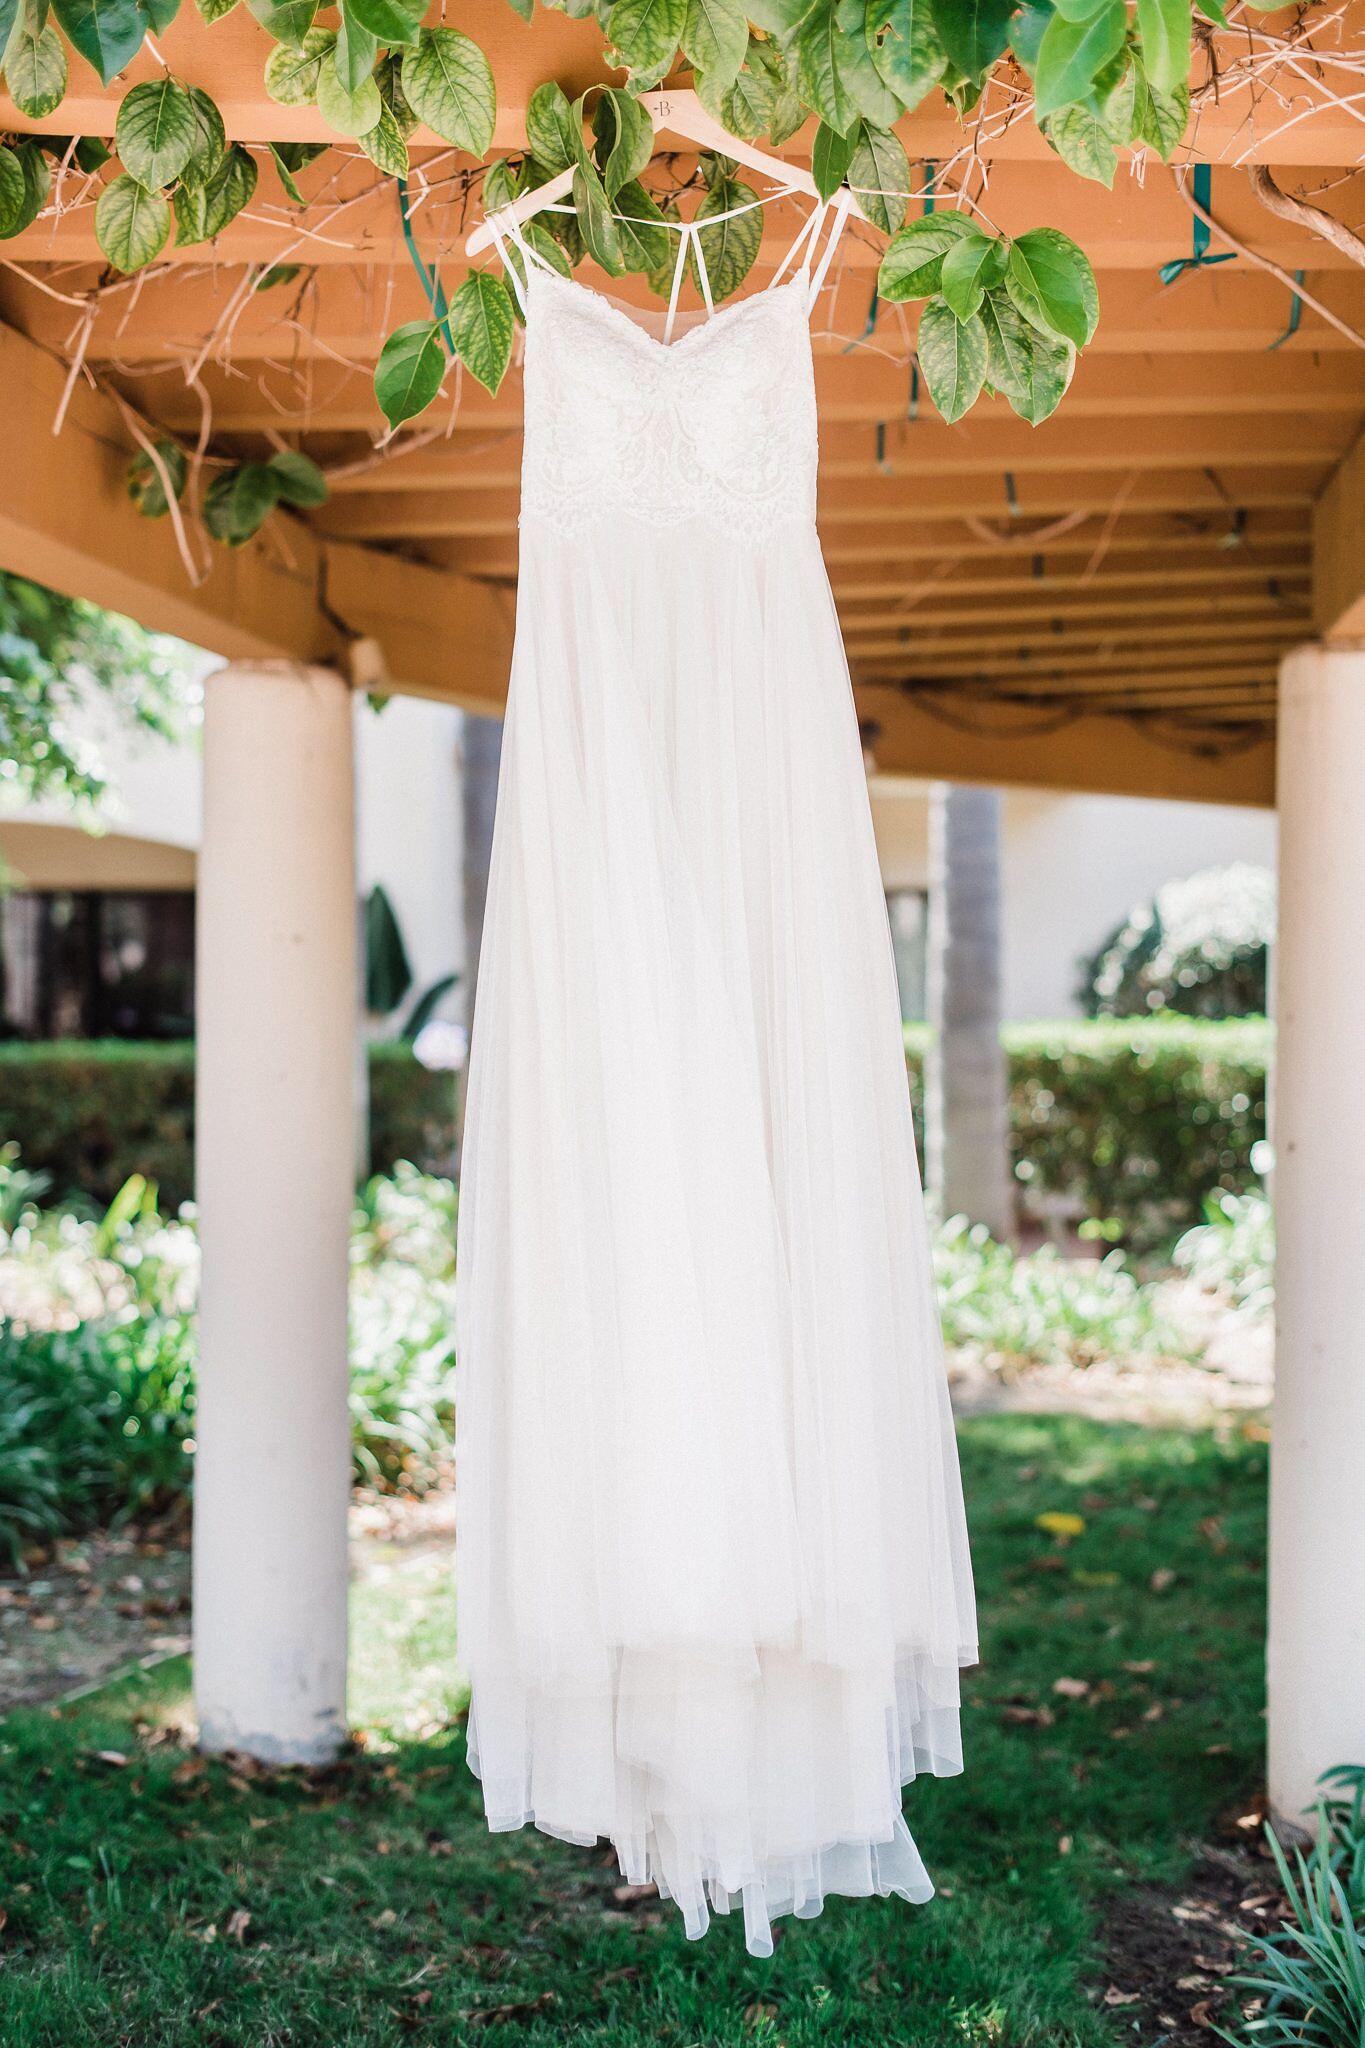 www.santabarbaraweddings.com | Photographer: Grace Kathryn | Venues: Villa & Vine, Santa Barbara Courthouse, Hilton Santa Barbara Resort | Coordination: Burlap & Bordeaux | Wedding Gown